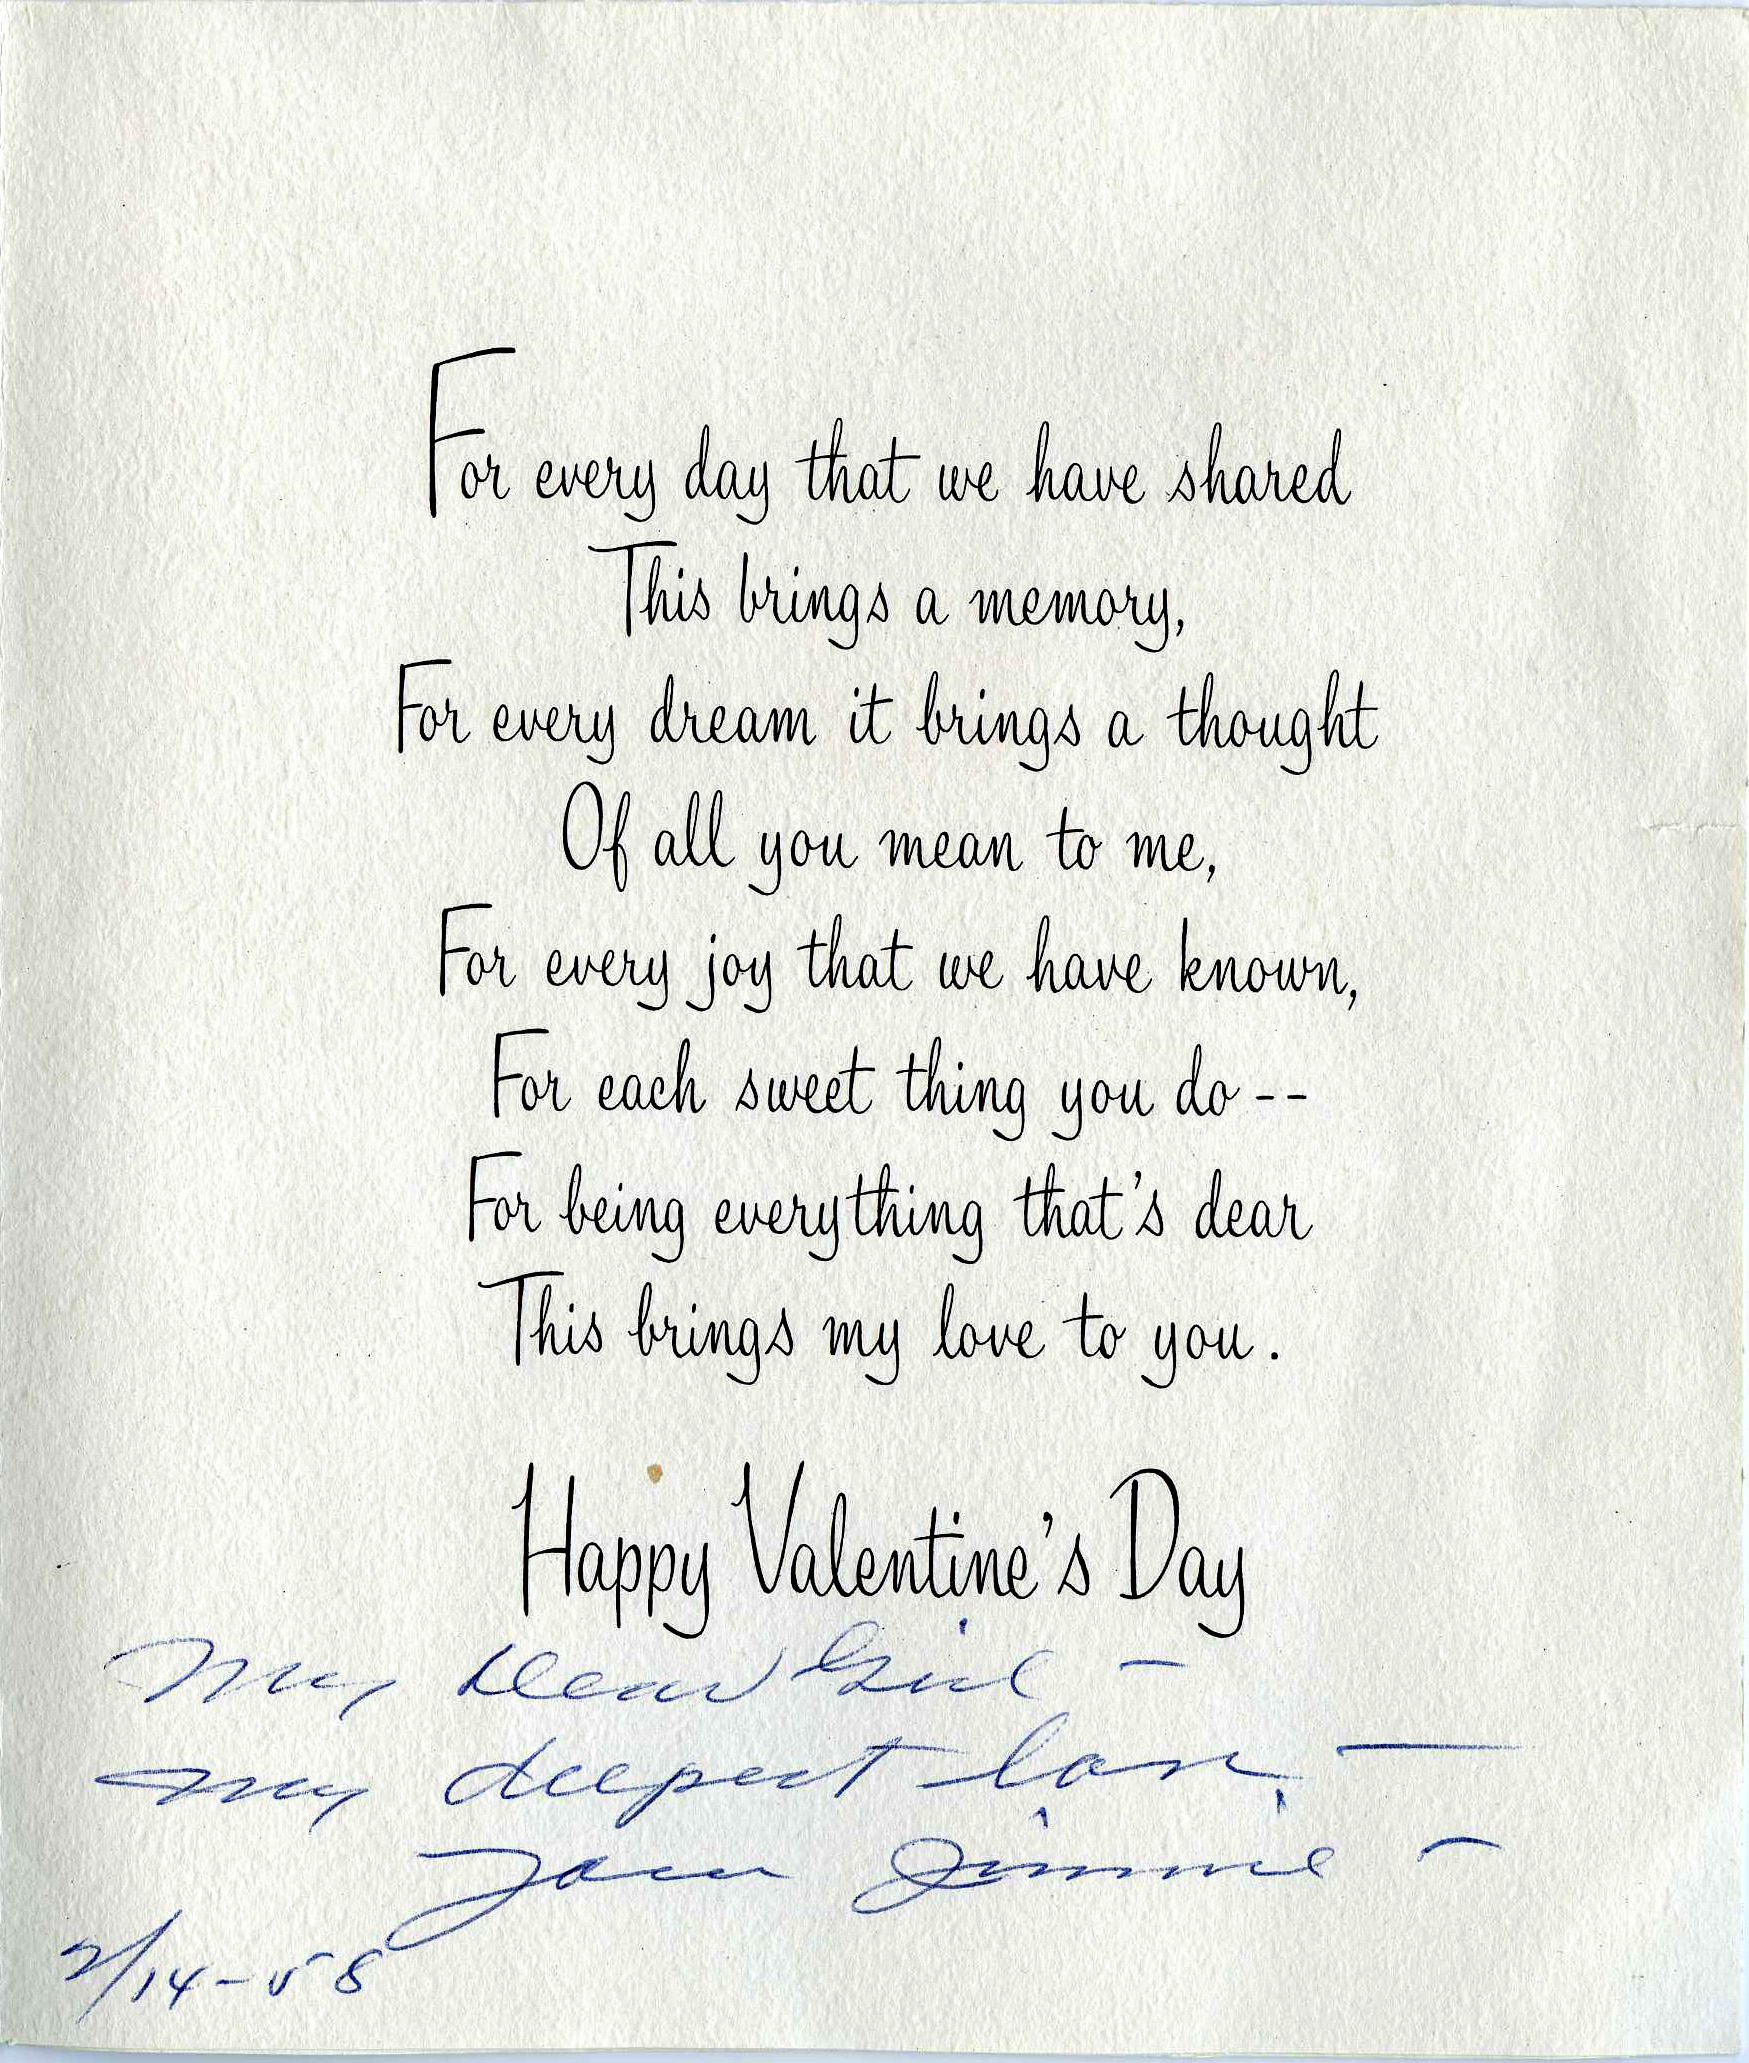 To My Valentine From Mr Jc Penney Smu